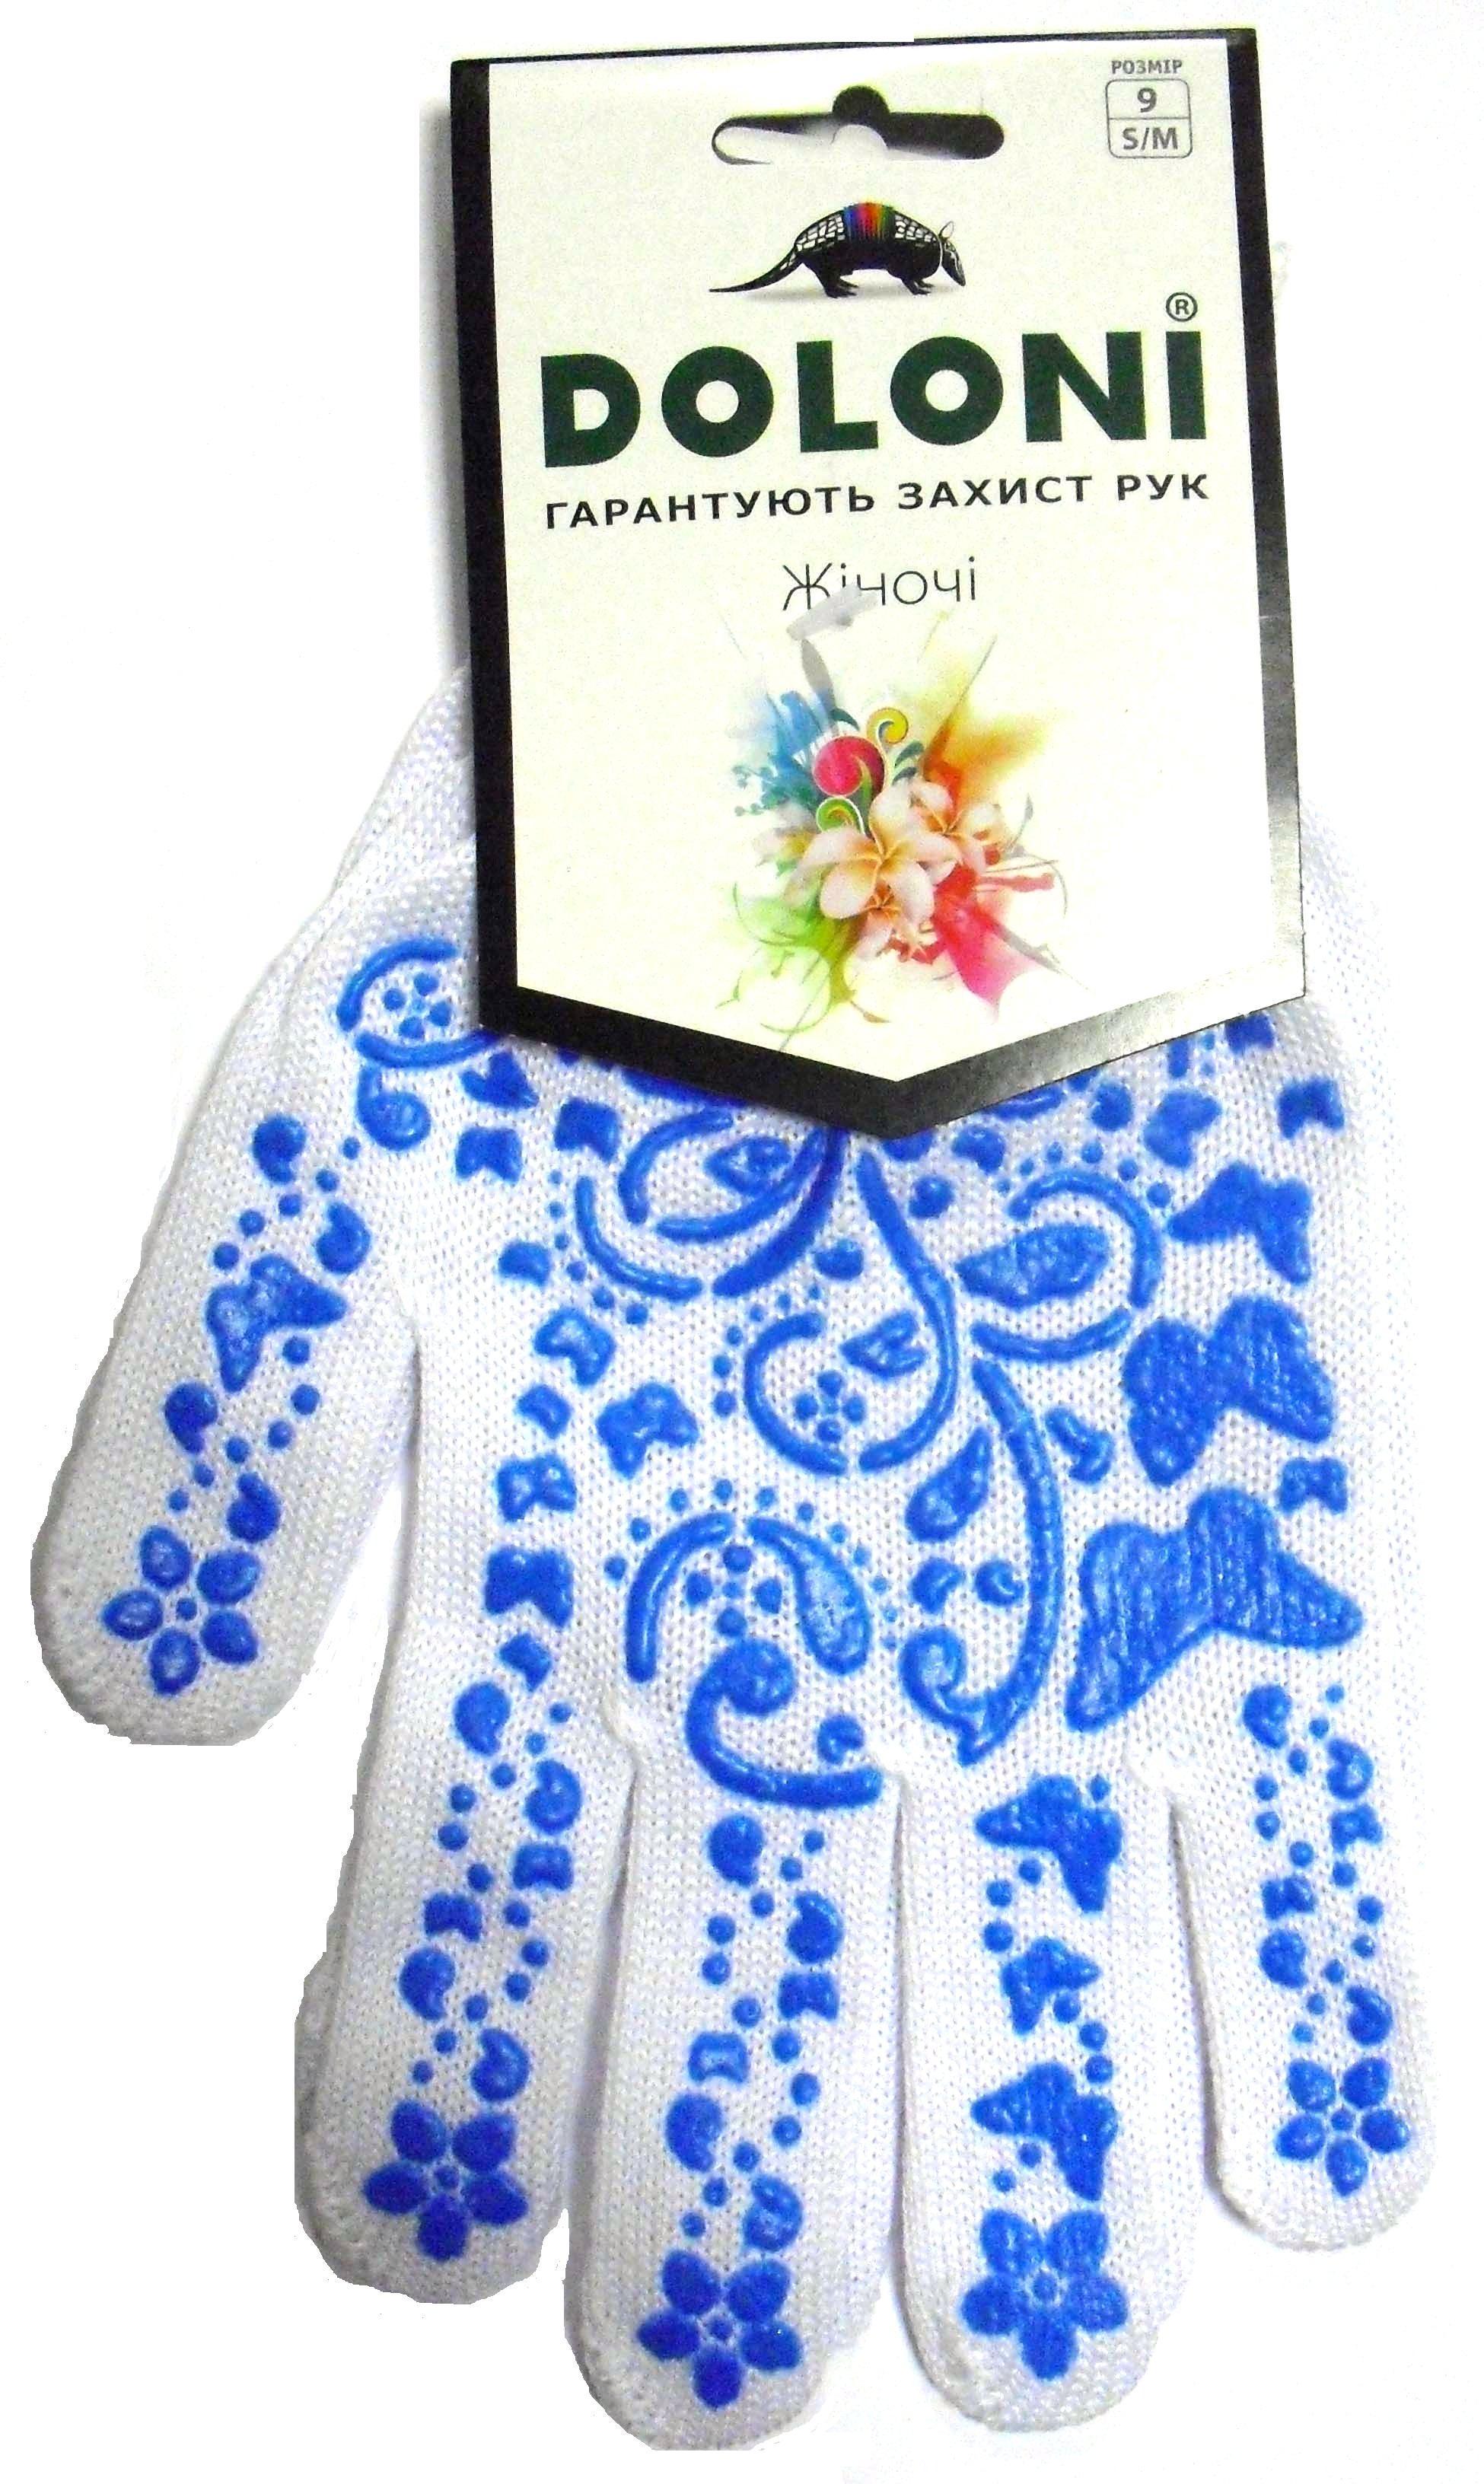 Перчатки ПВХ Doloni 711 белая с голубым рисунком ПВХ